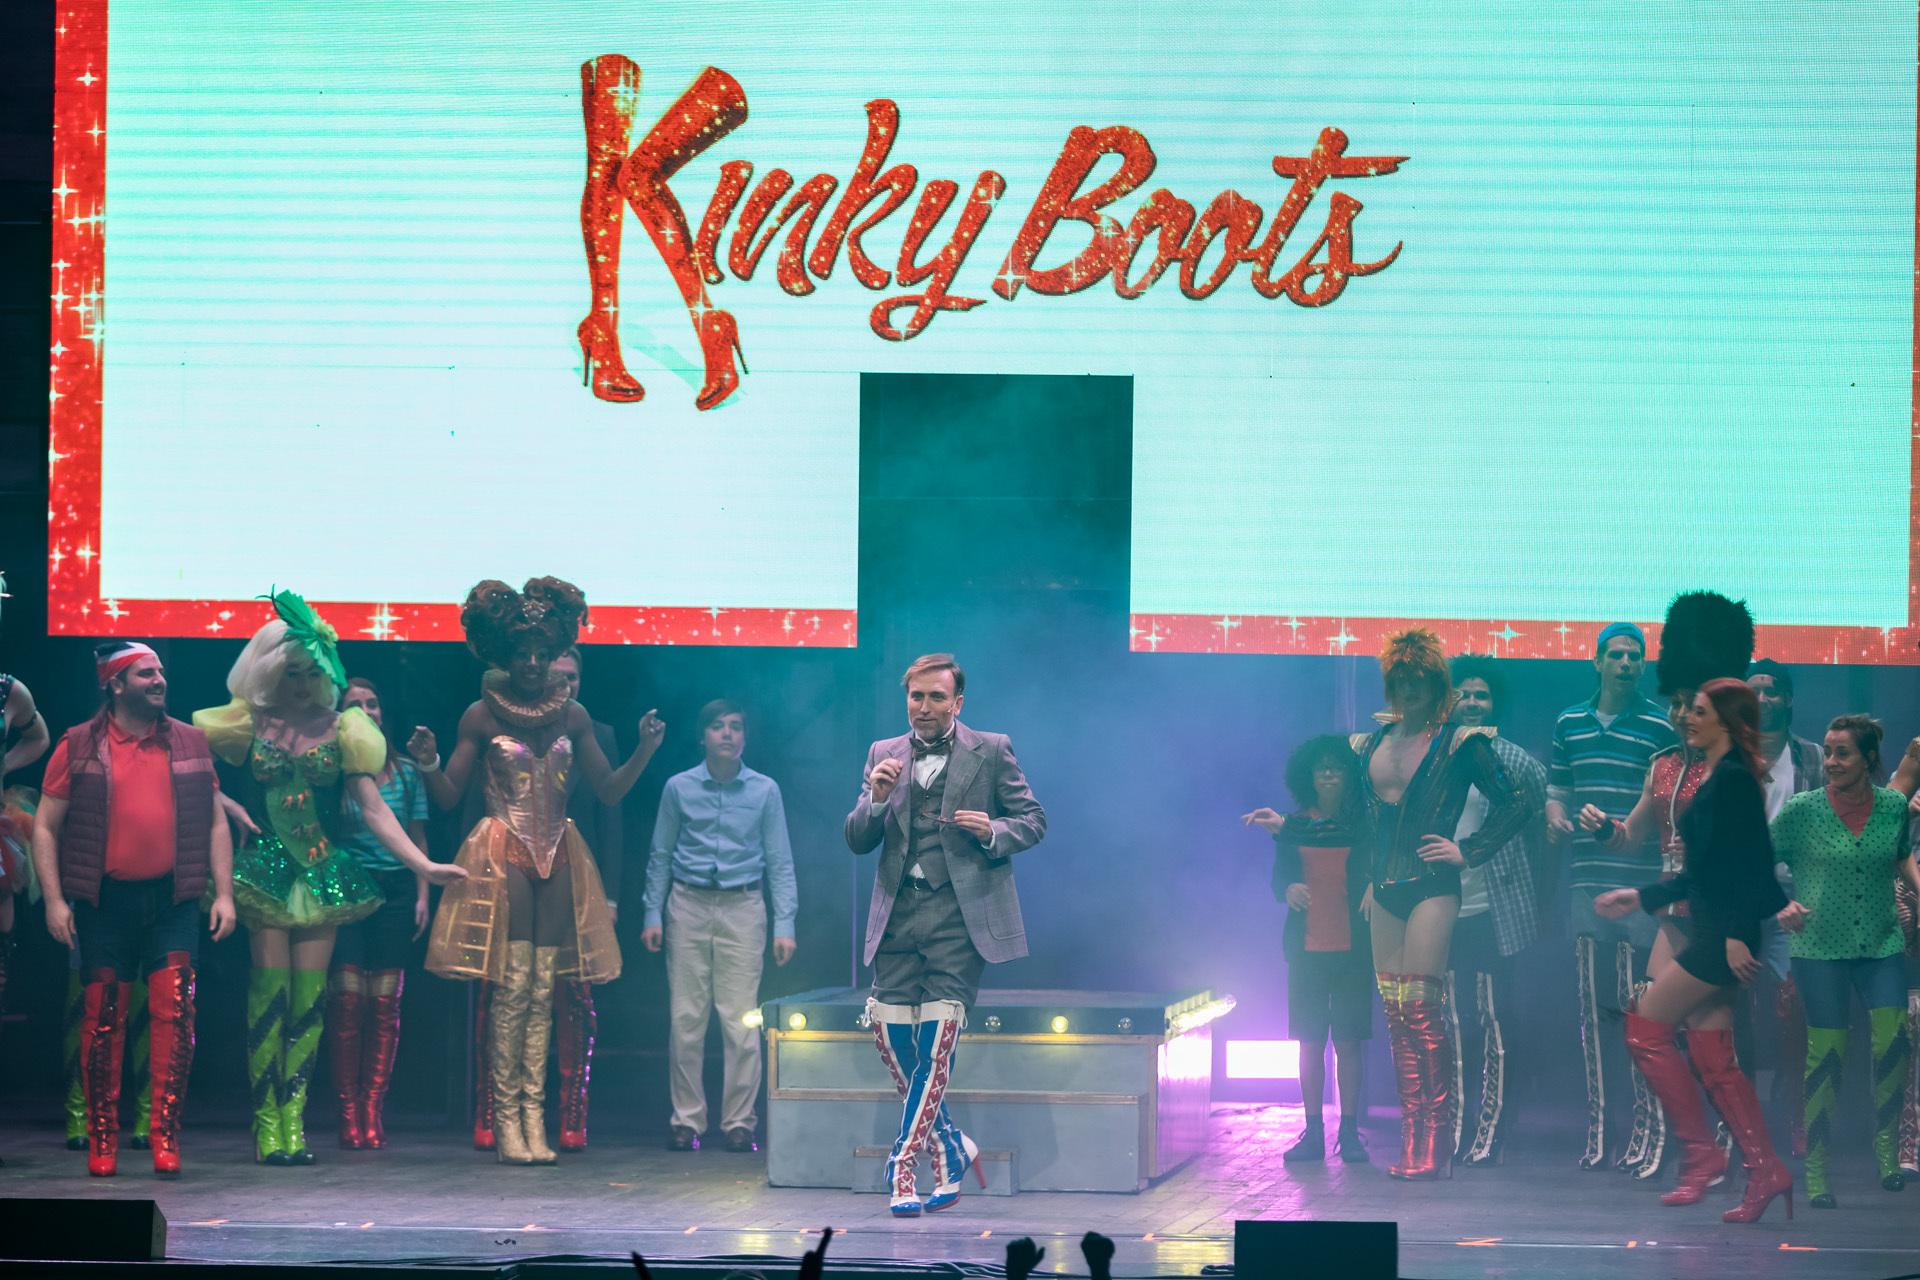 2018_11_30-©-LKV-Kinky-Boots-233319-5D4A5773